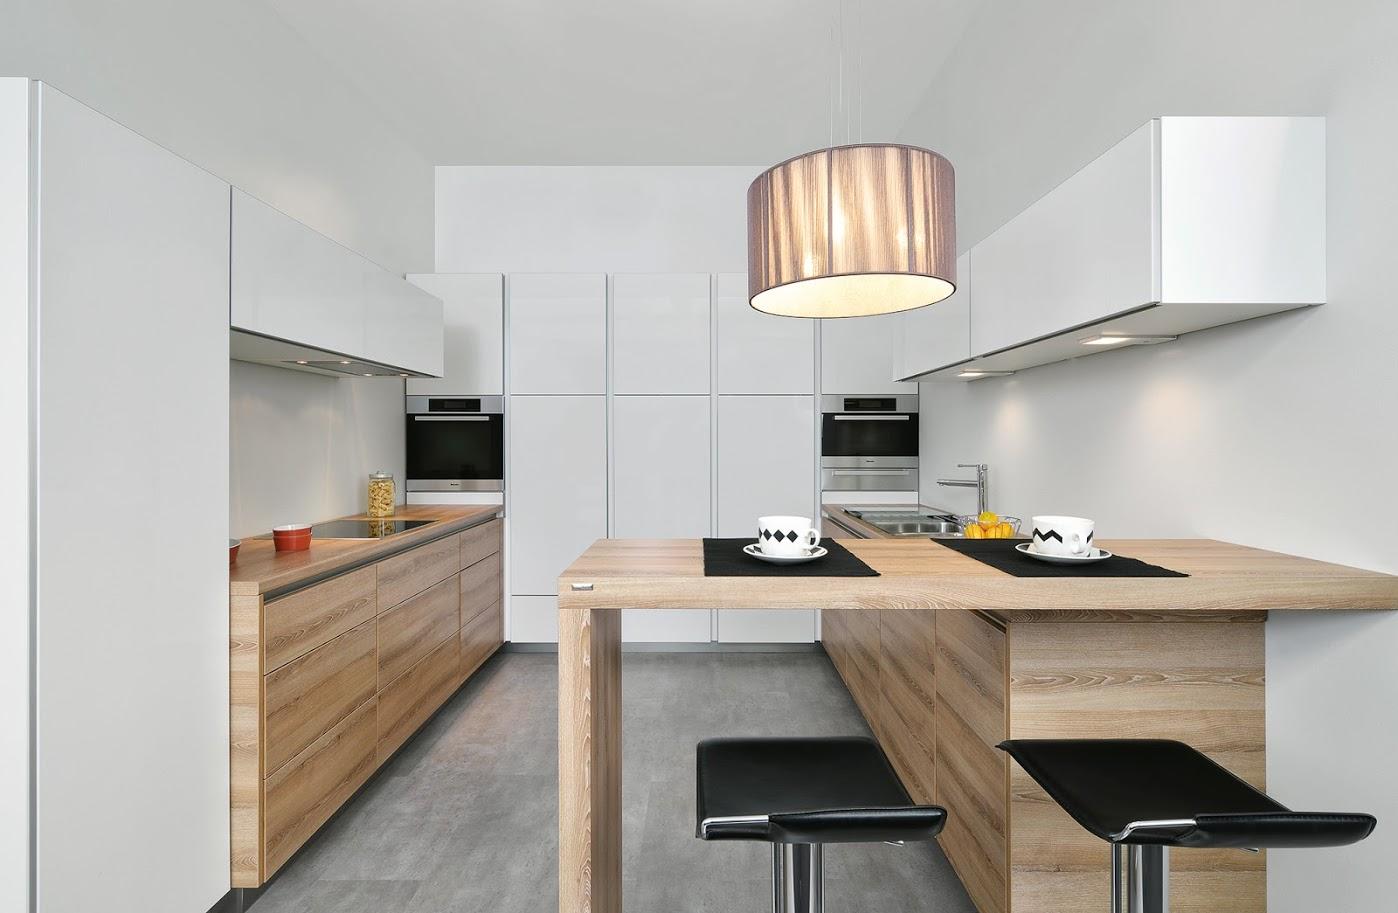 holzk chen aus echtholz oder holzdekor auf mallorca montieren. Black Bedroom Furniture Sets. Home Design Ideas